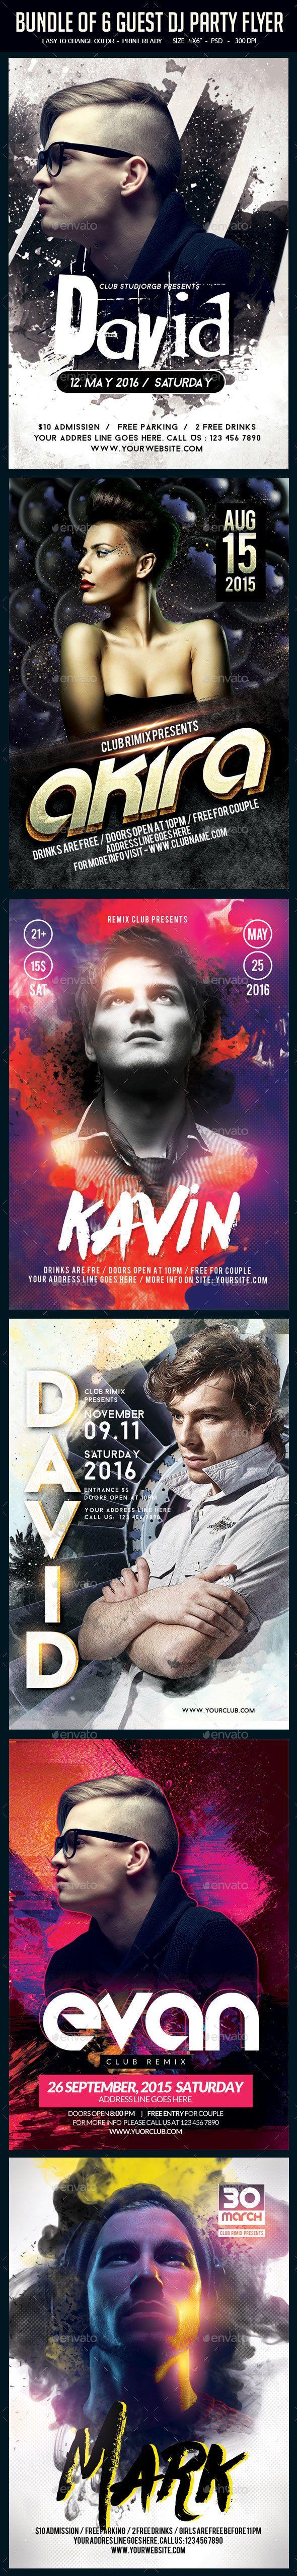 6 poster design photo mockups - Bundle Of 6 Guest Dj Party Flyers